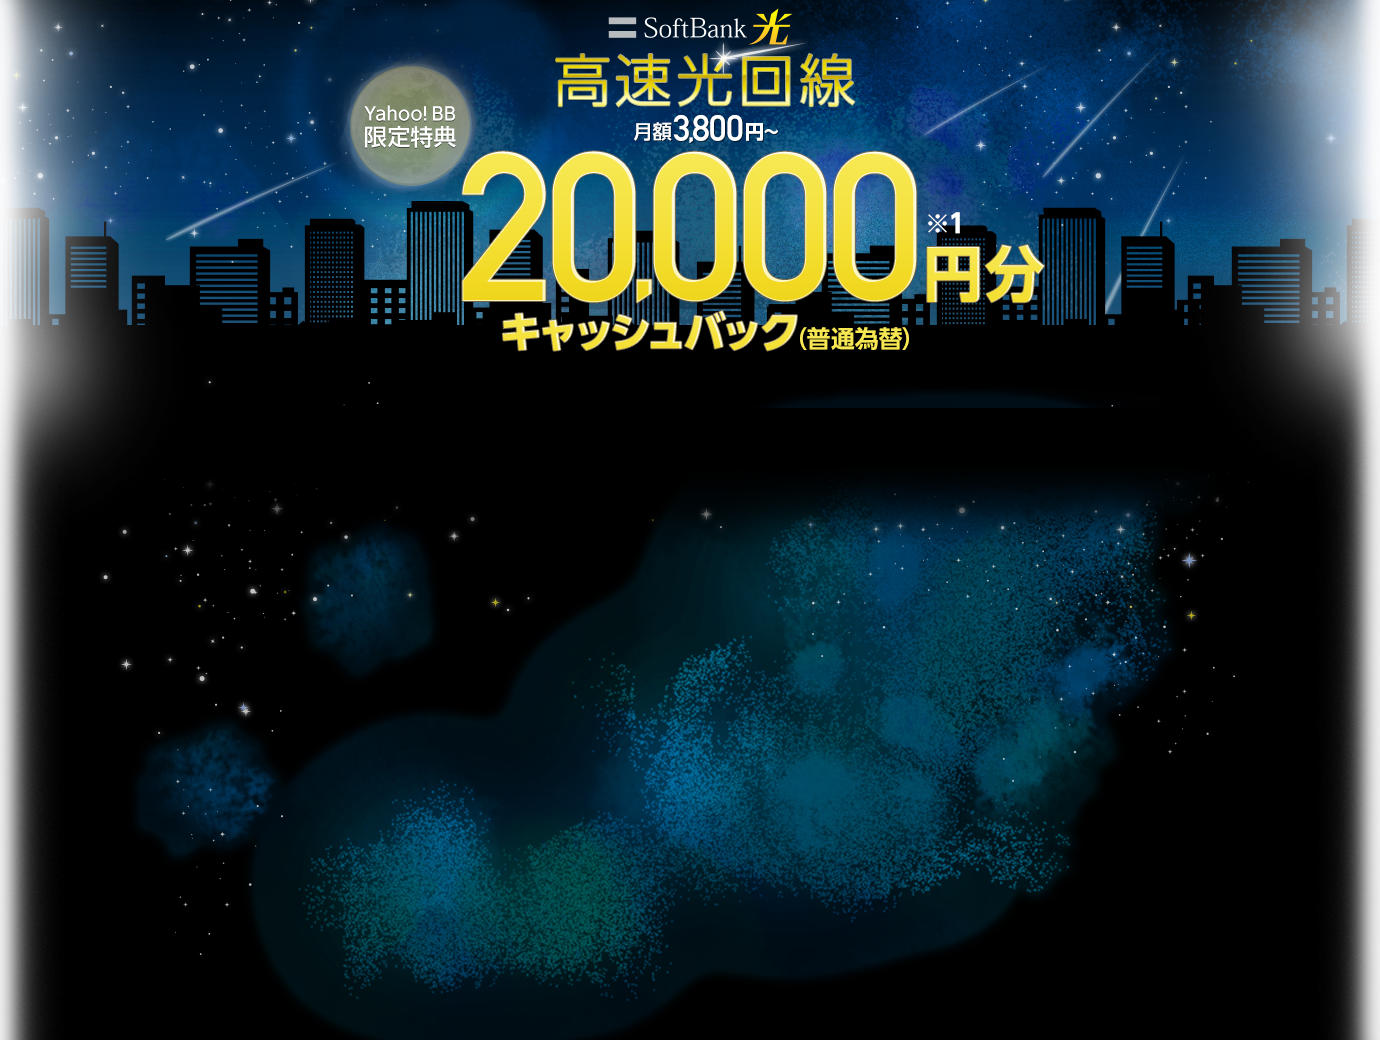 SoftBank 光 高速光回線 月額3,800円~ Yahoo! BB 限定特典 20,000円分キャッシュバック(普通為替) ※1